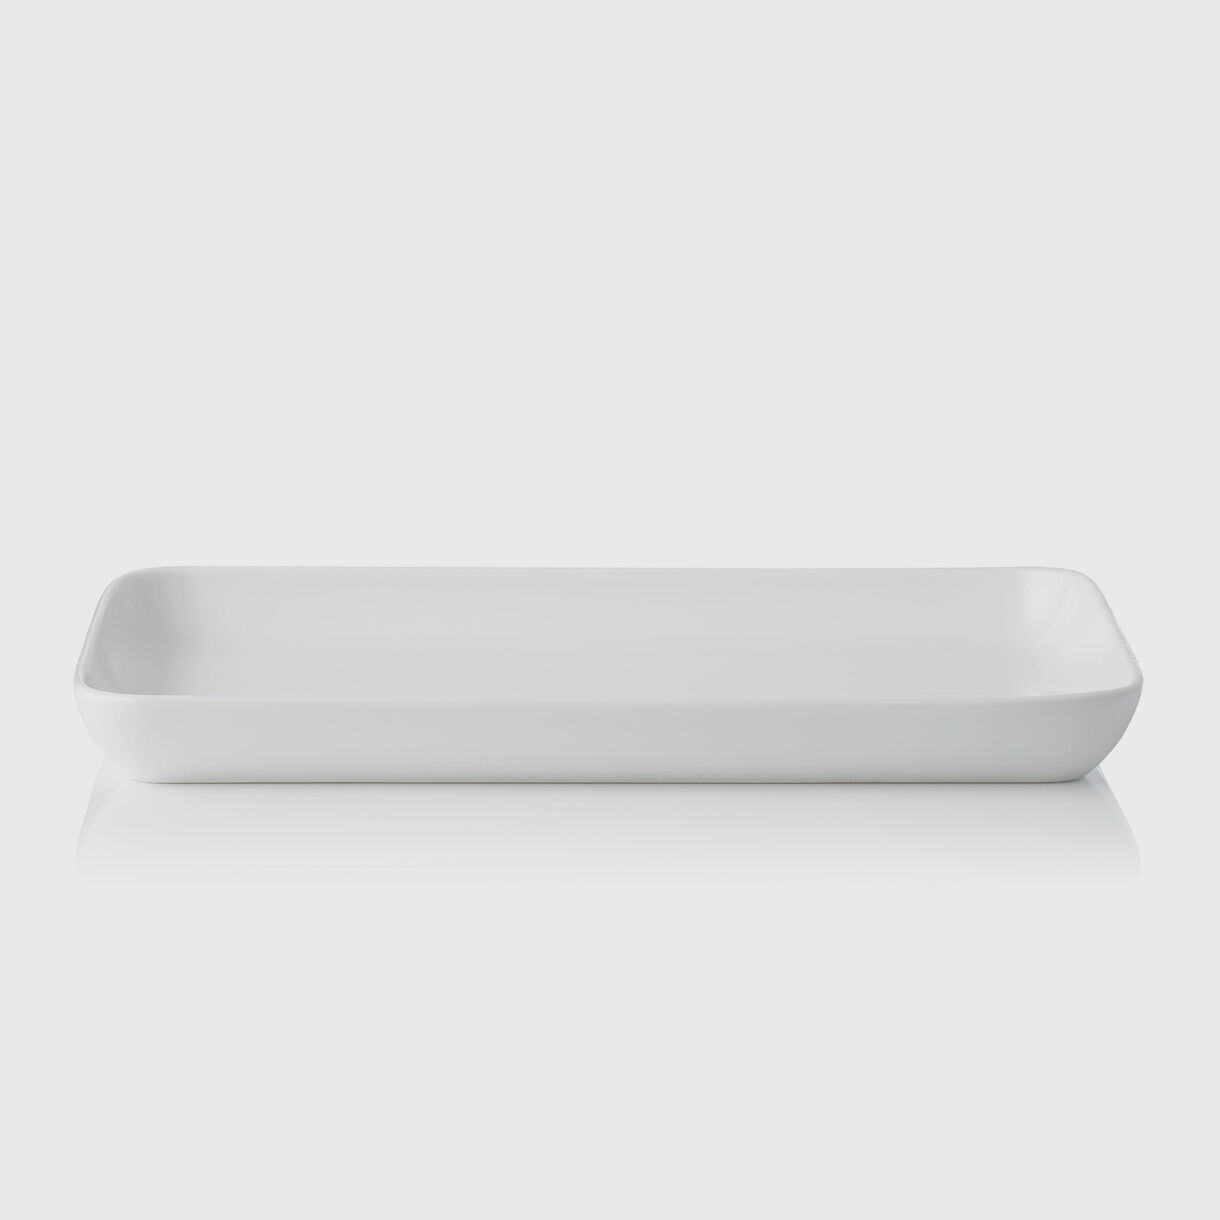 Mark Newson by Noritake Serving Platter